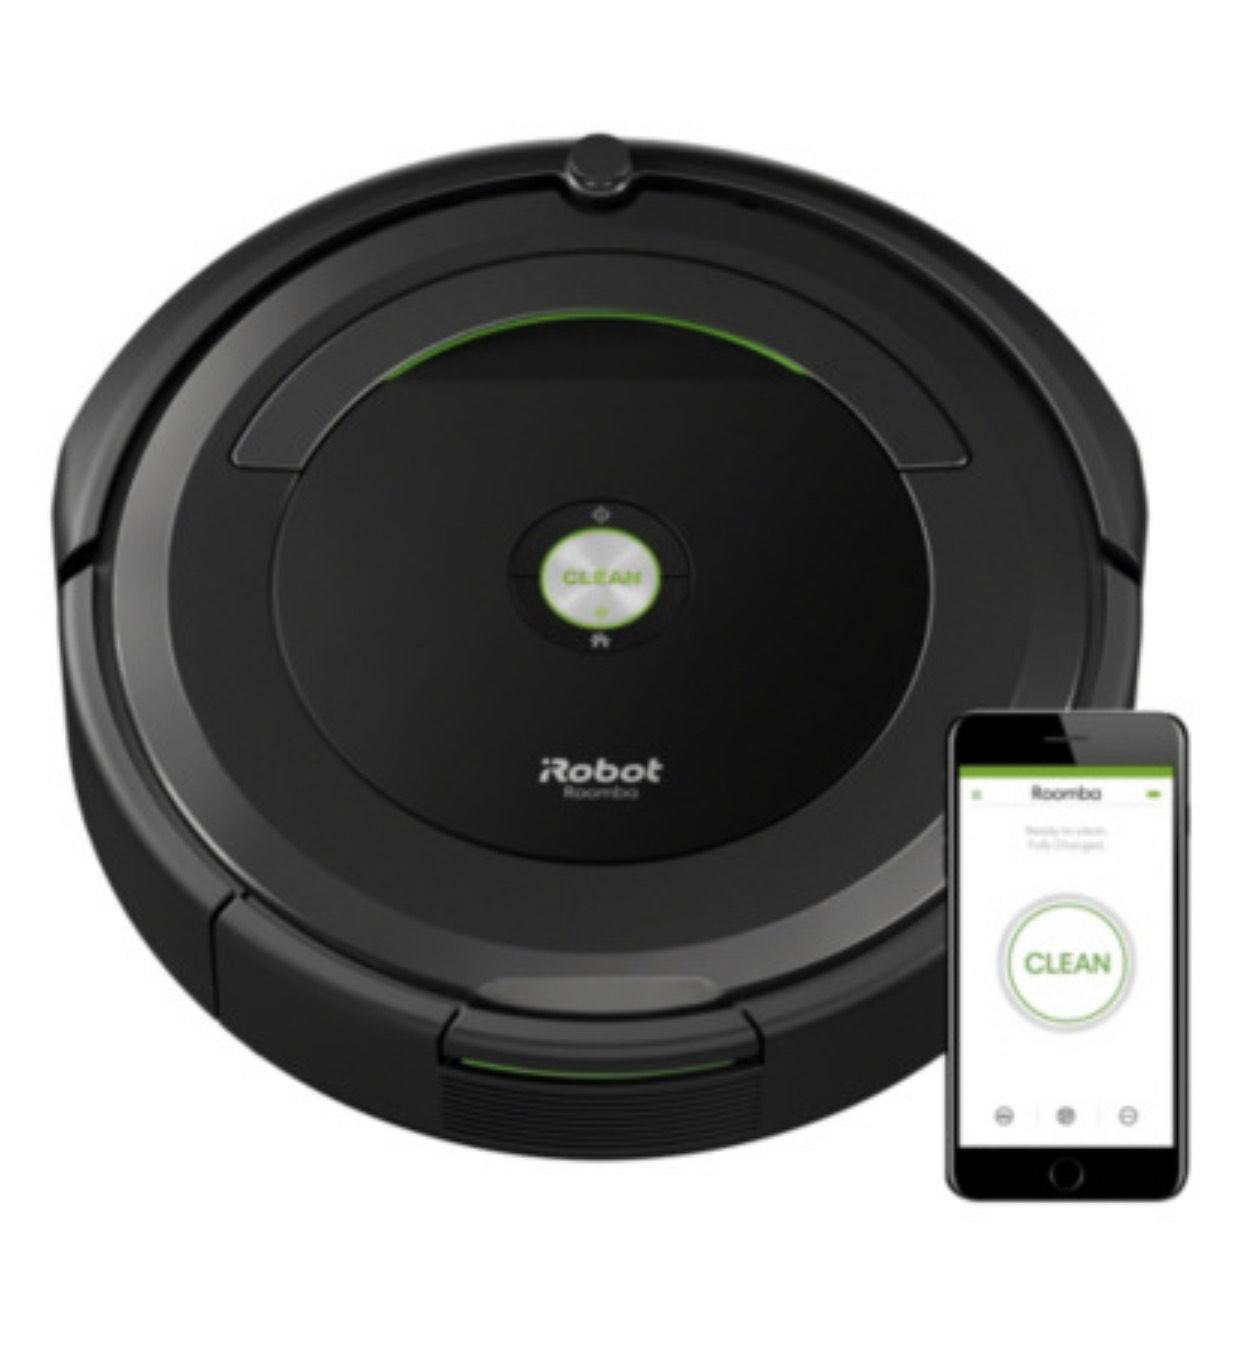 IROBOT Roomba 966, IROBOT Roomba 696 und IROBOT Roomba E5